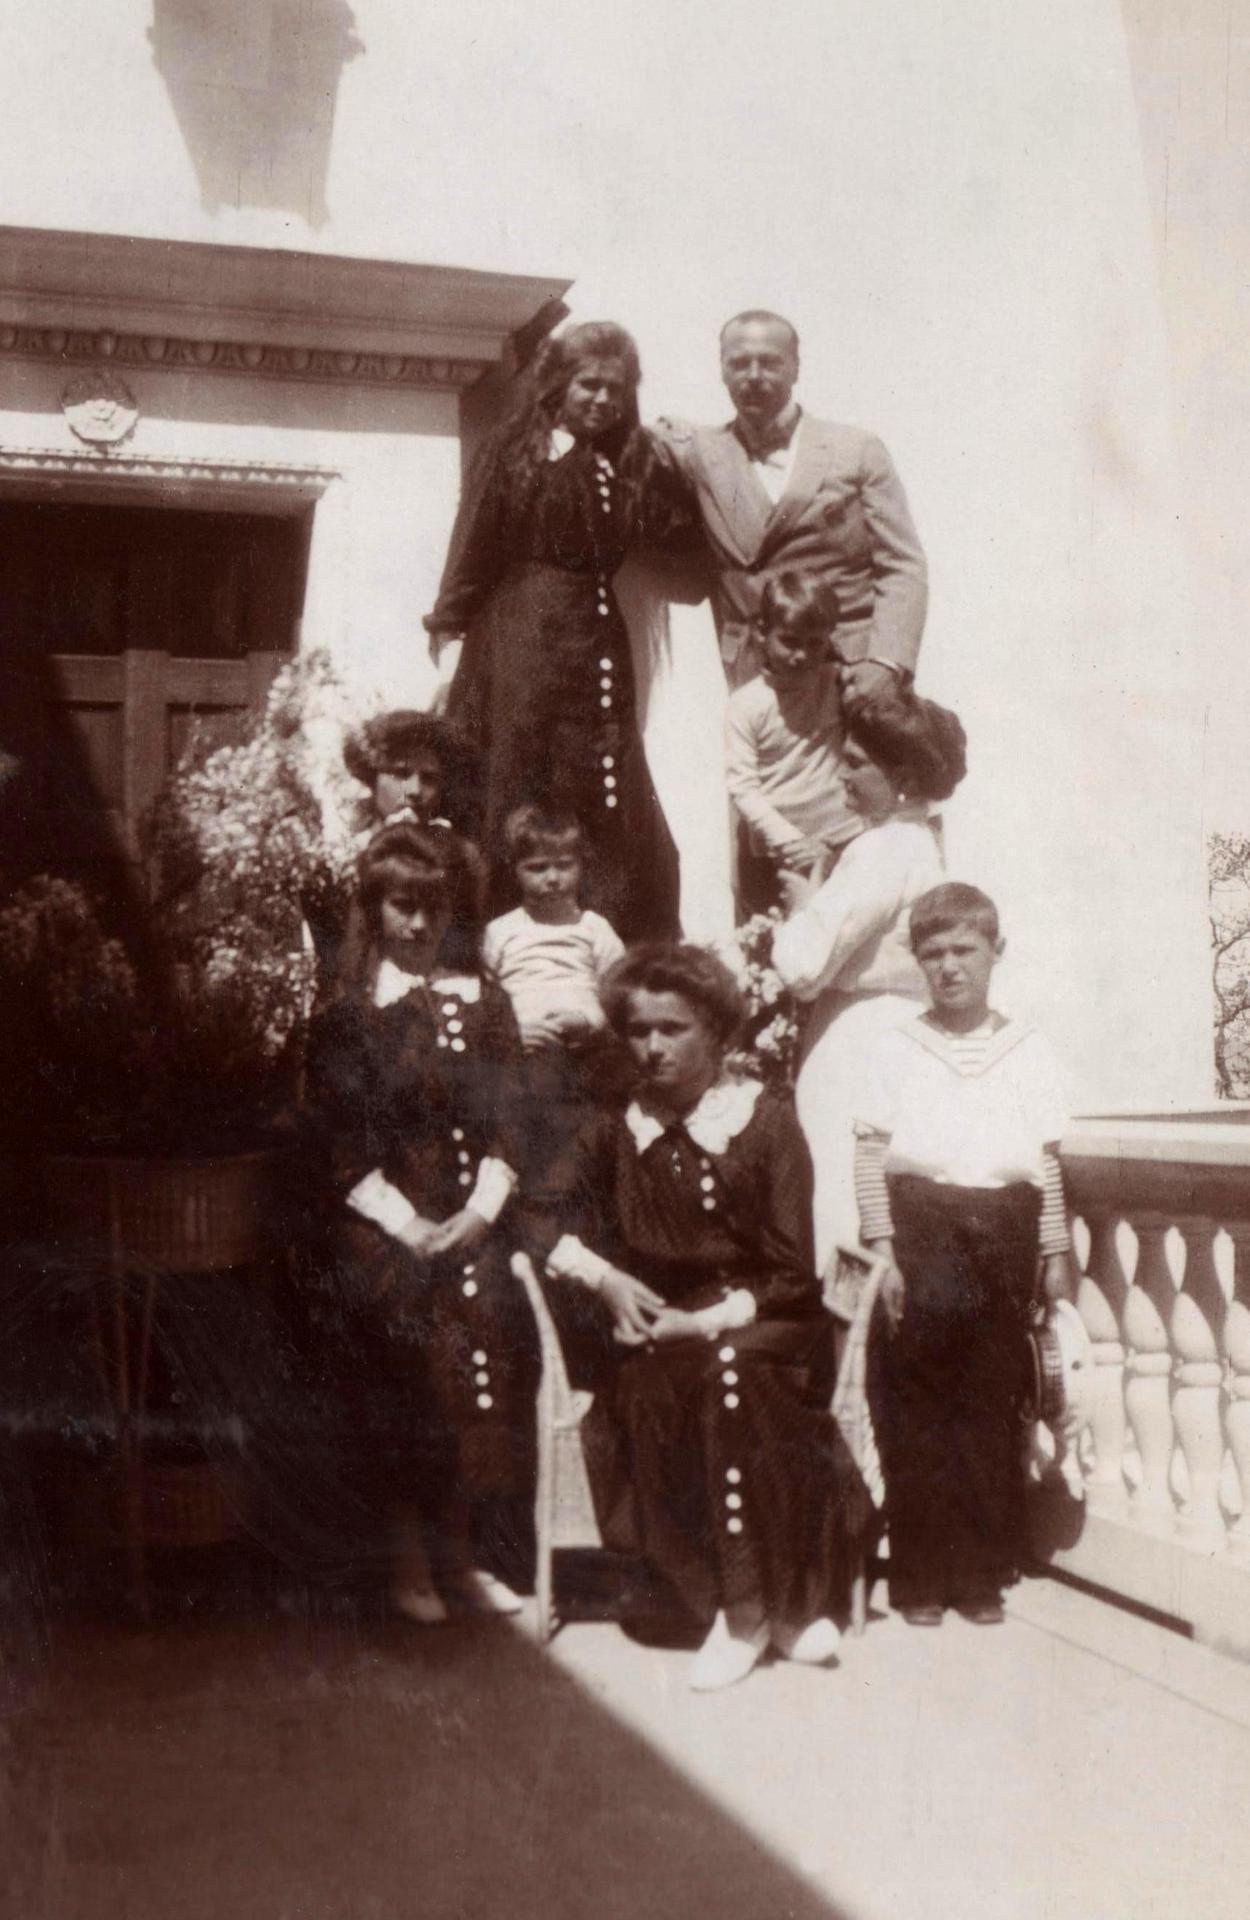 House Of Romanov With Images House Of Romanov Romanov